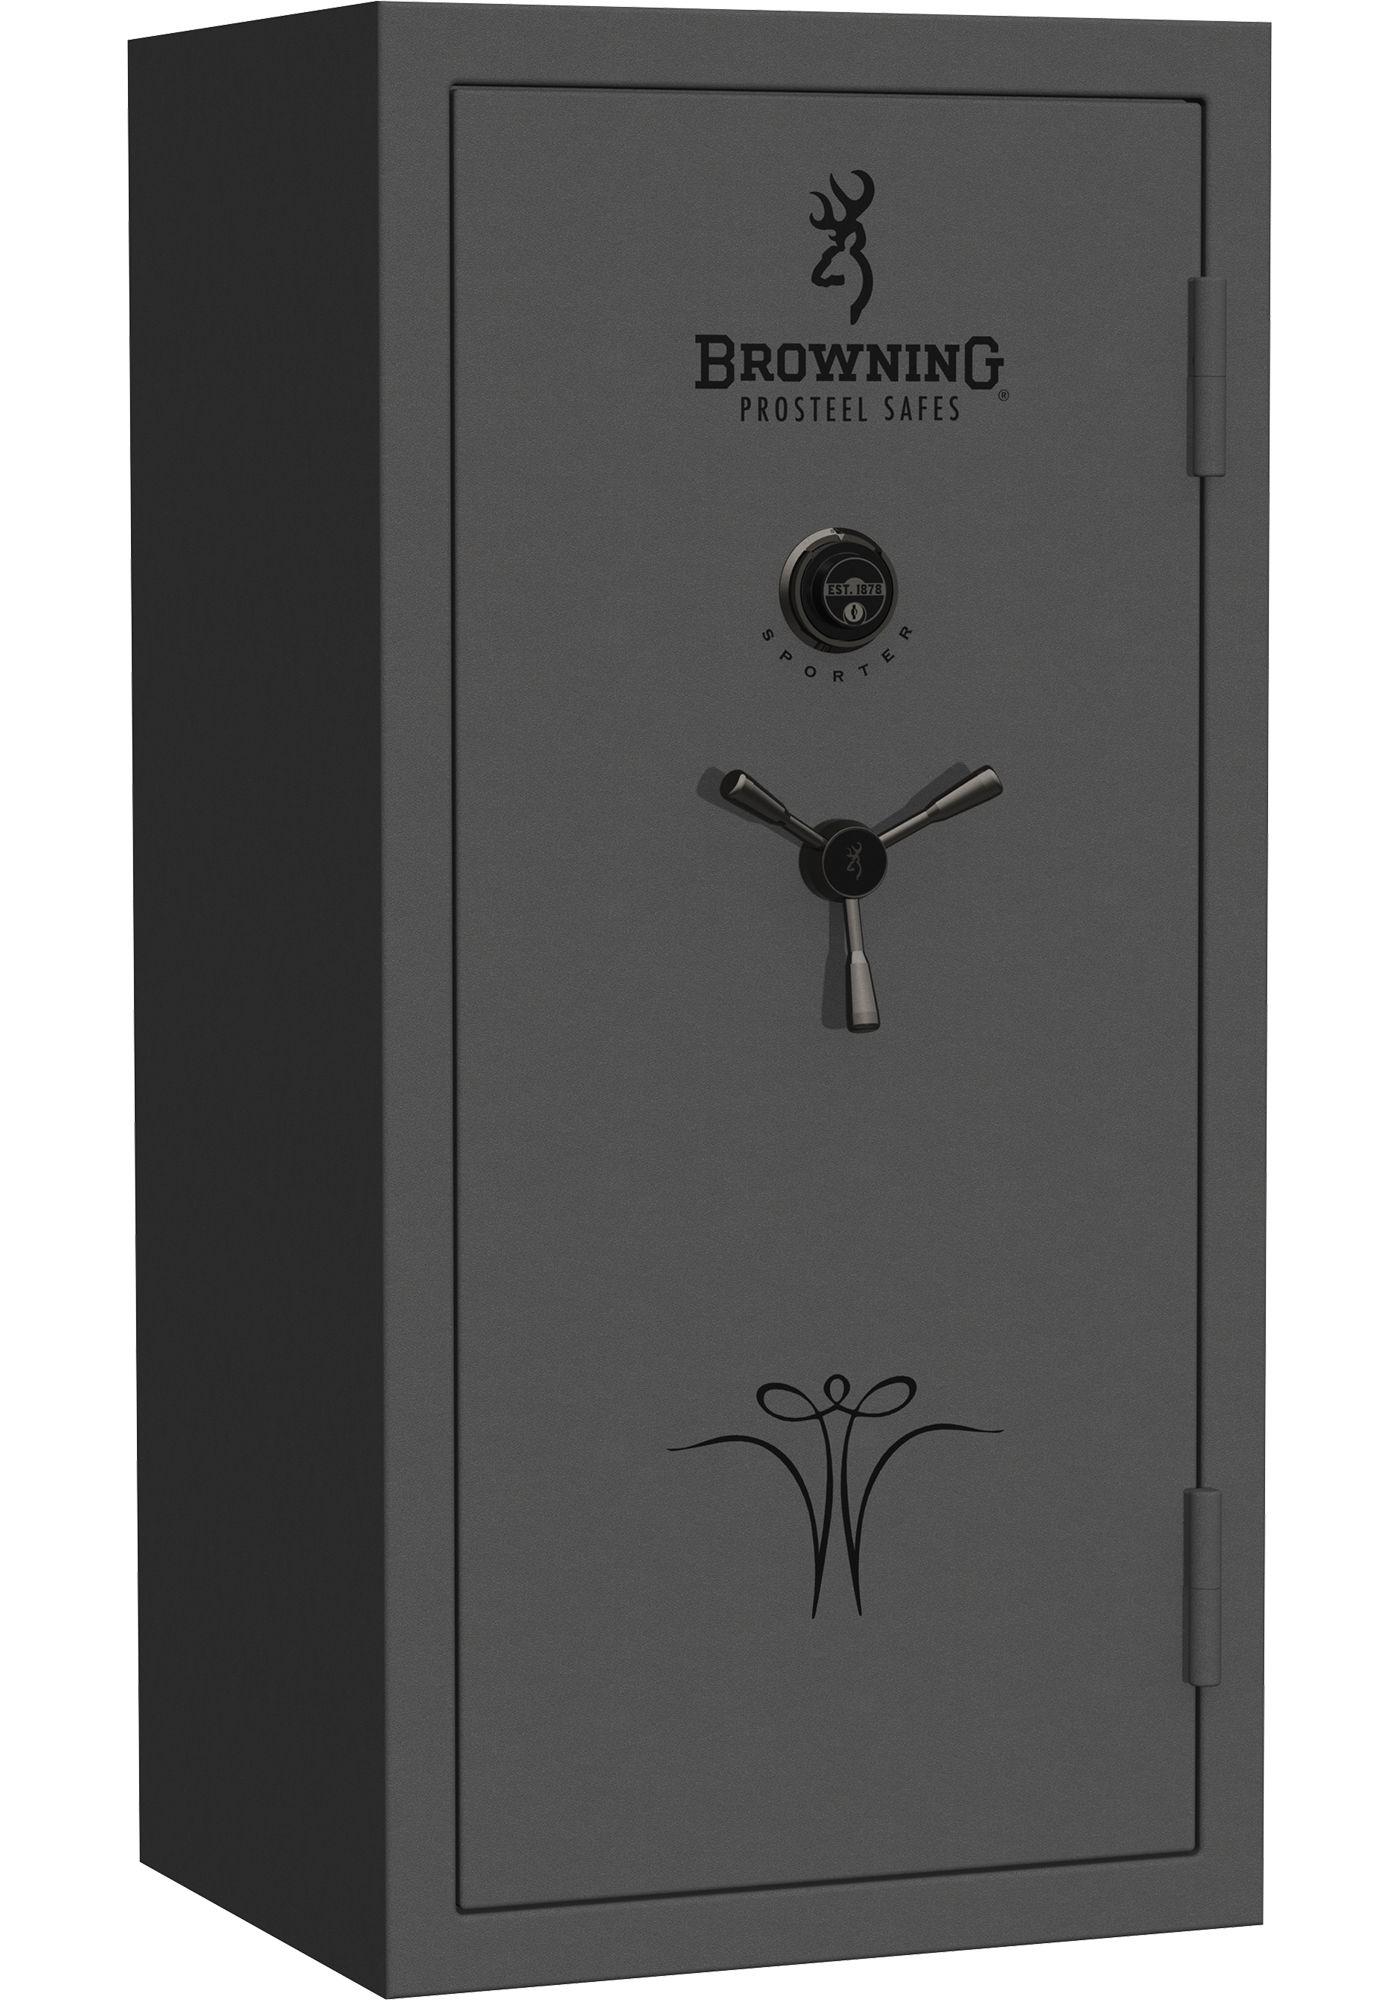 Browning Sporter Standard 33-Gun Fire Safe with Combination Lock